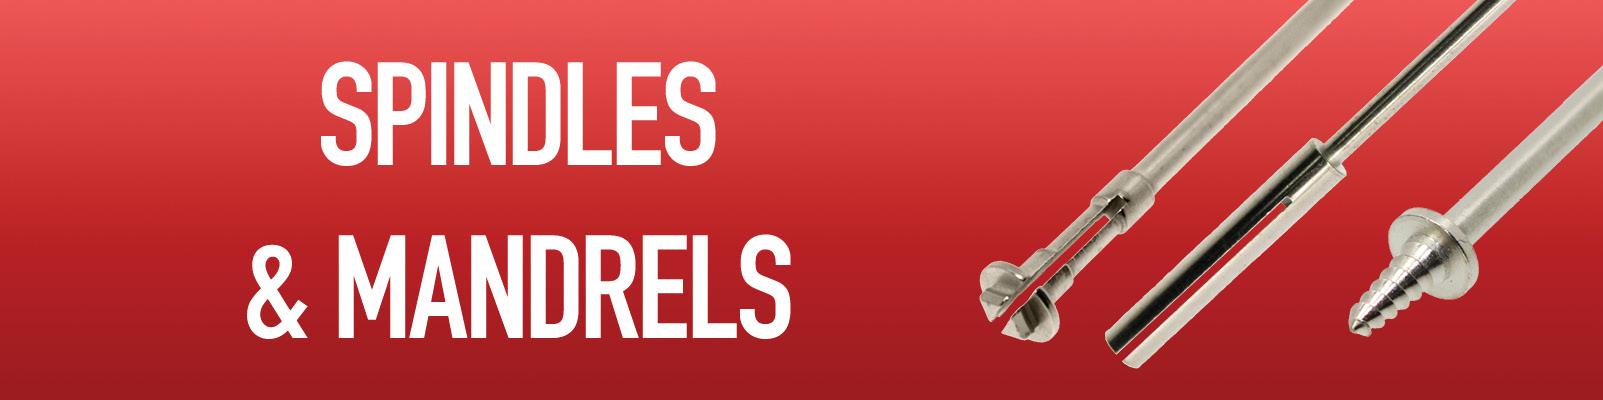 Spindles & Mandrels